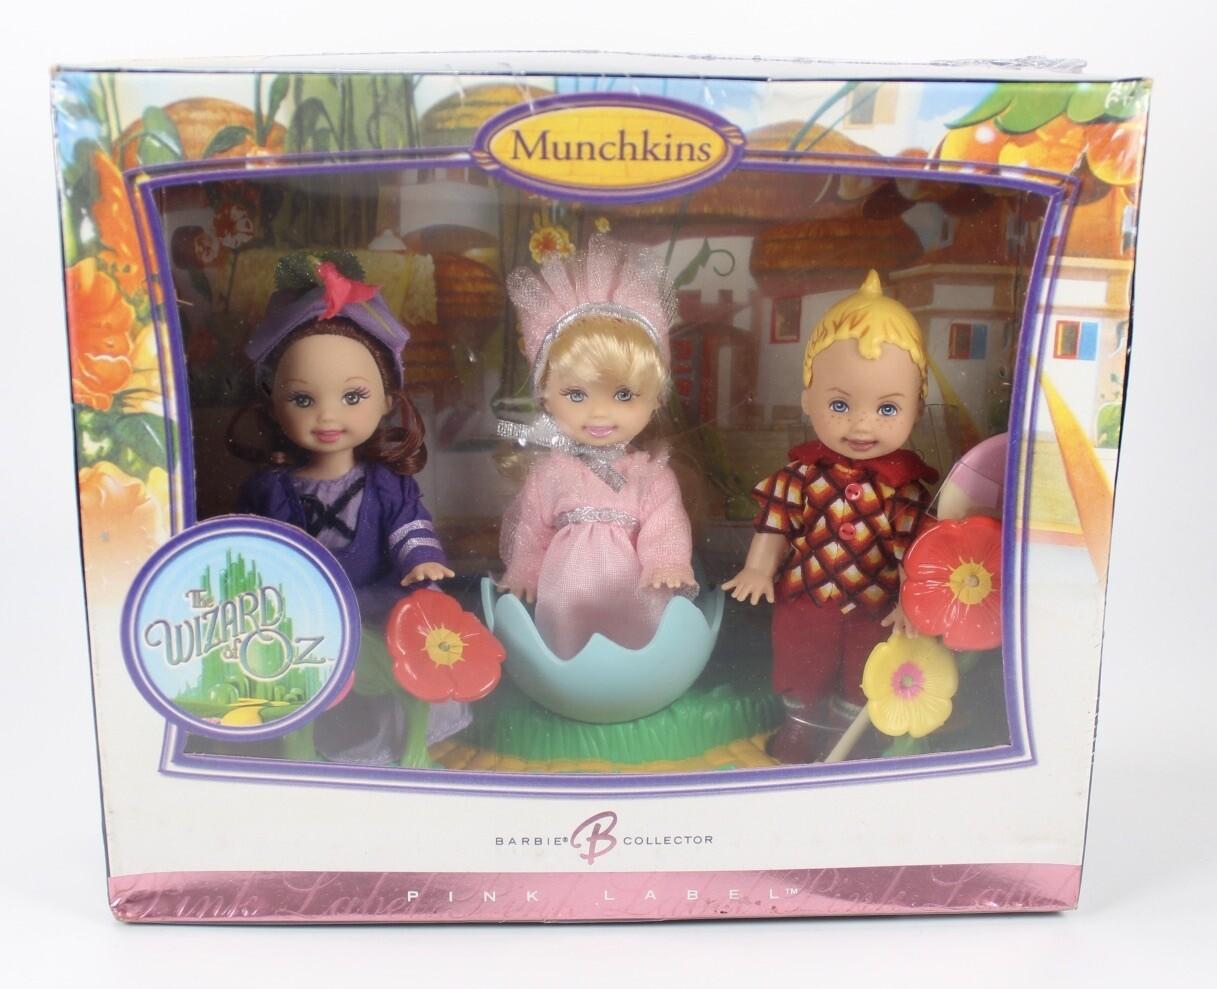 2006 Pink Label Wizard of Oz Munchkins Kelly & Tommy Barbie Dolls NRFB